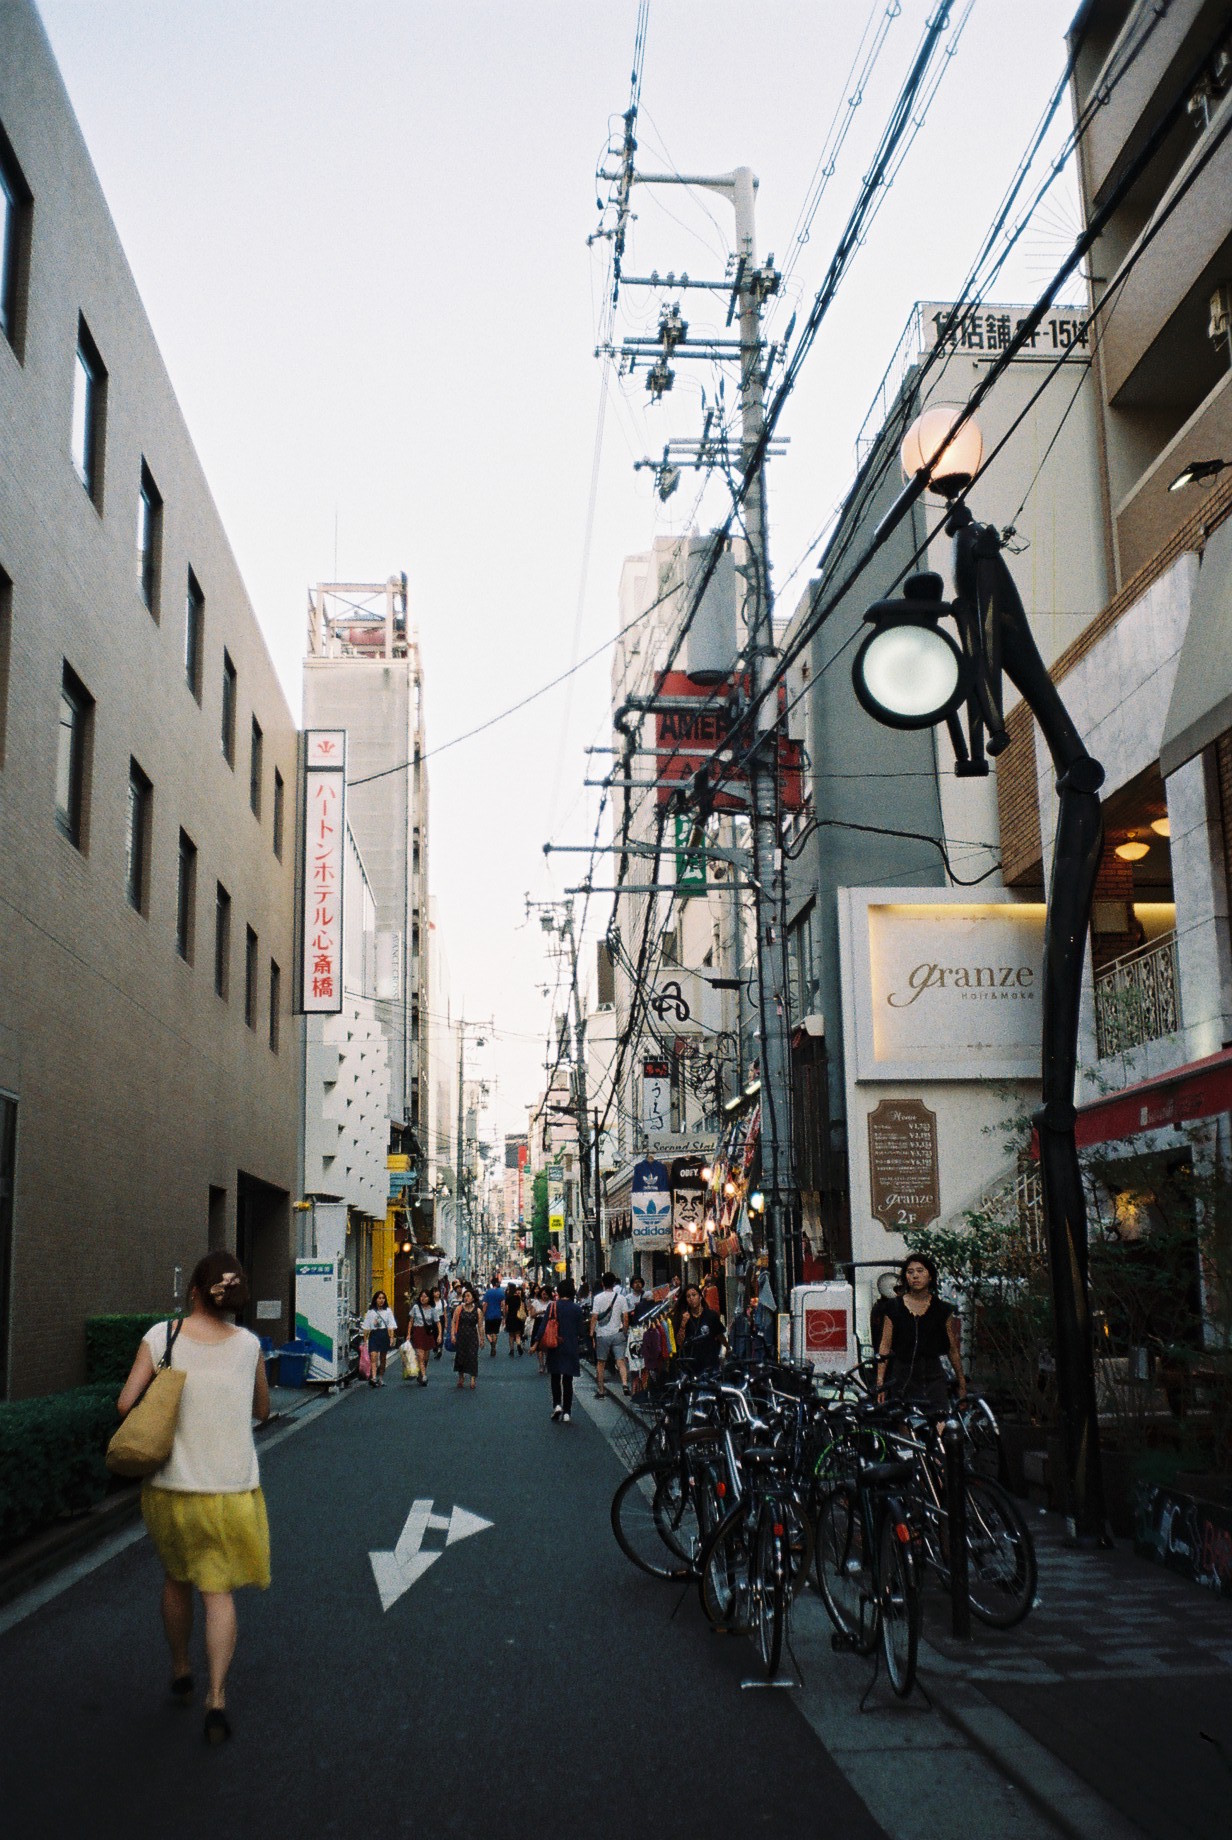 03-JAPON-argentic-Osaka-aout-2016-036.JPG